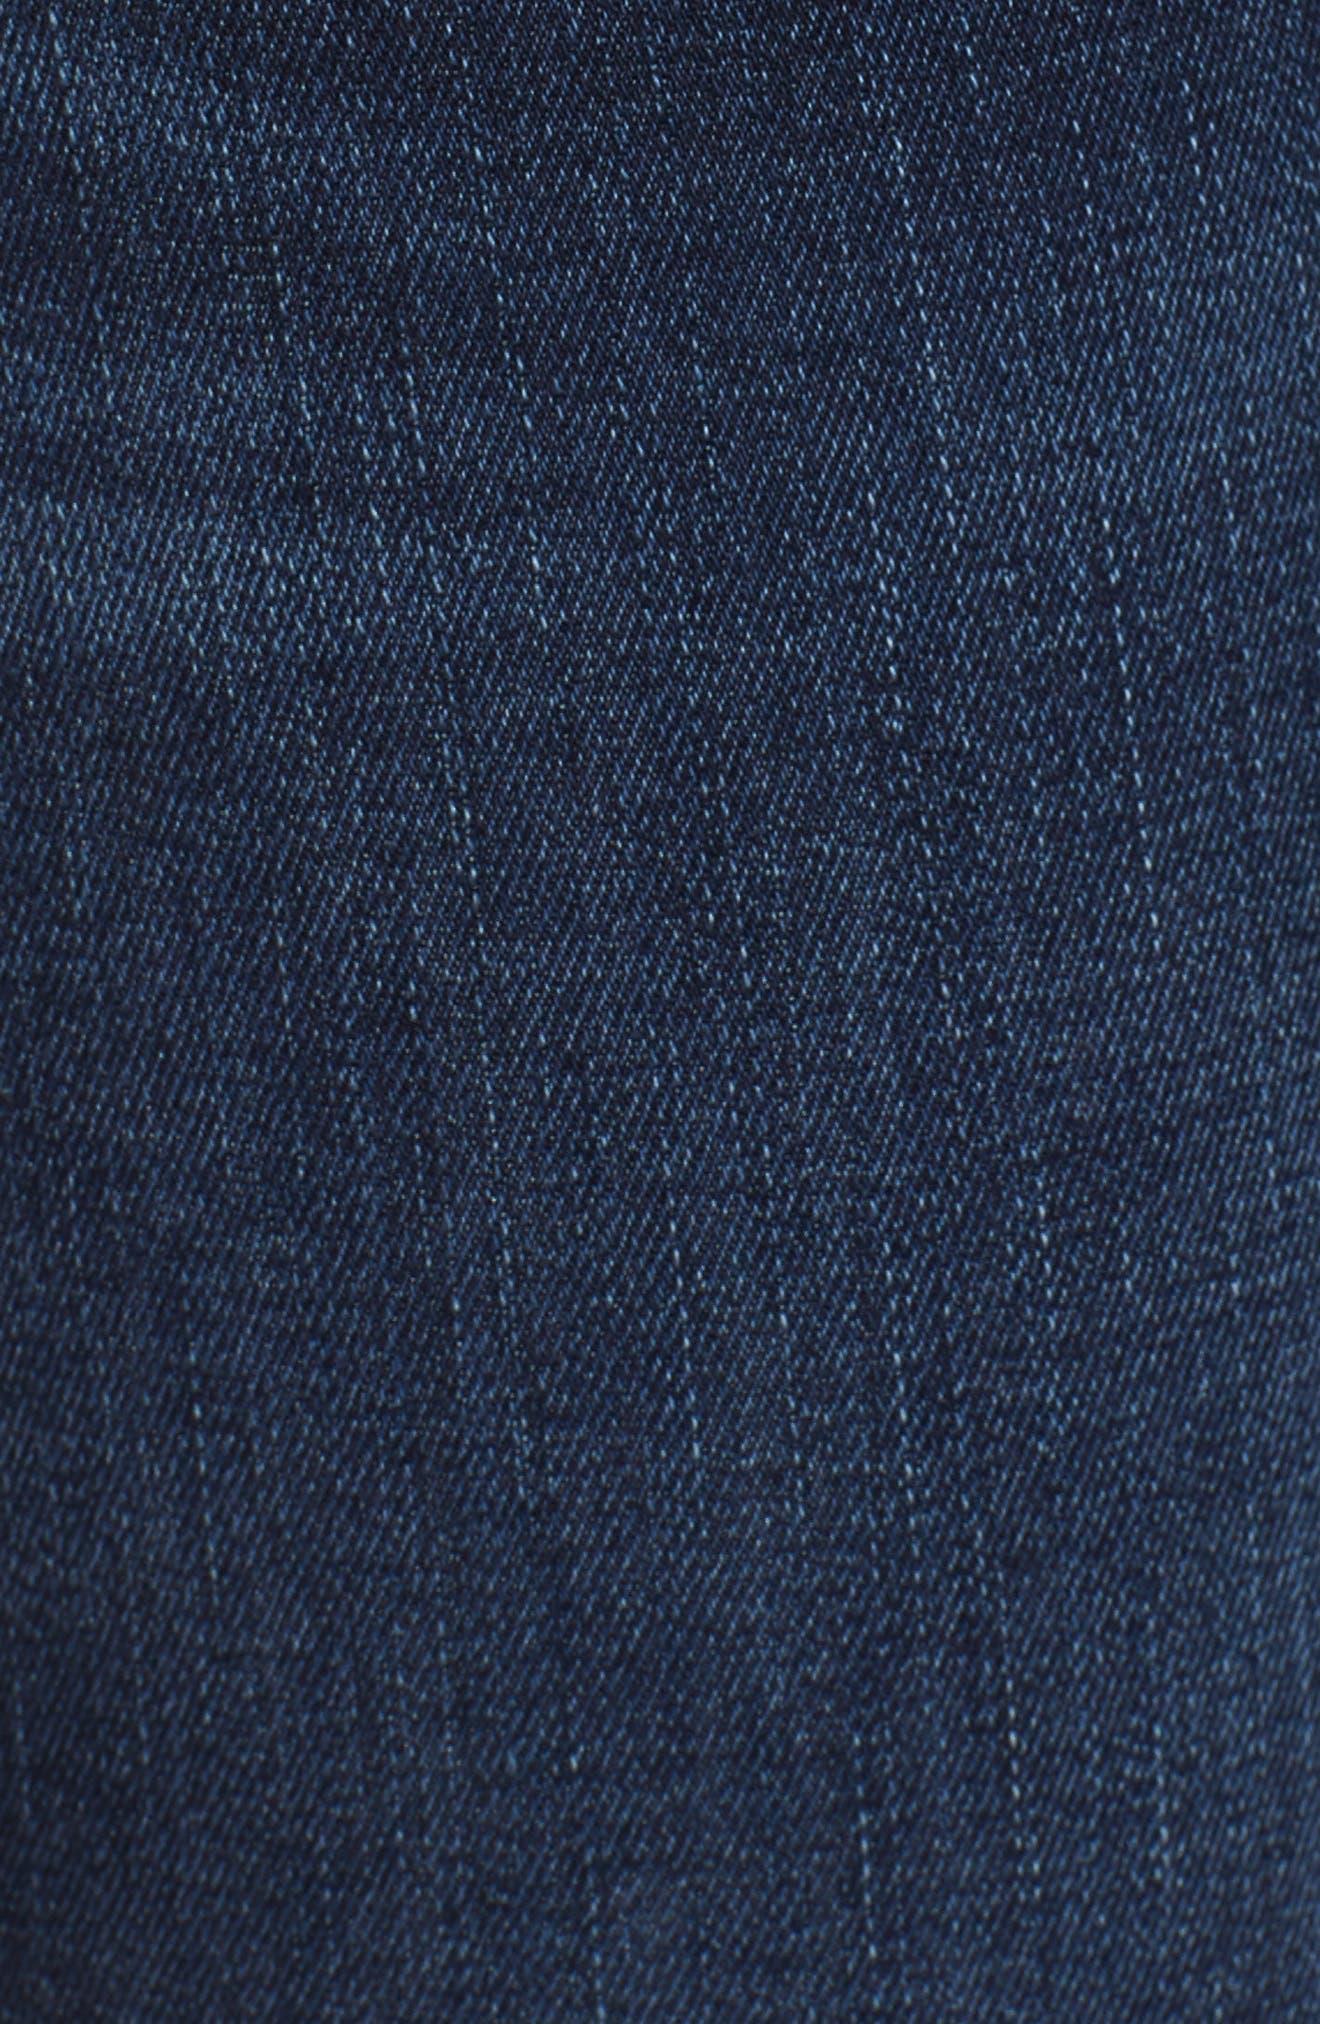 Florence Instasculpt Crop Skinny Jeans,                             Alternate thumbnail 6, color,                             Ralston